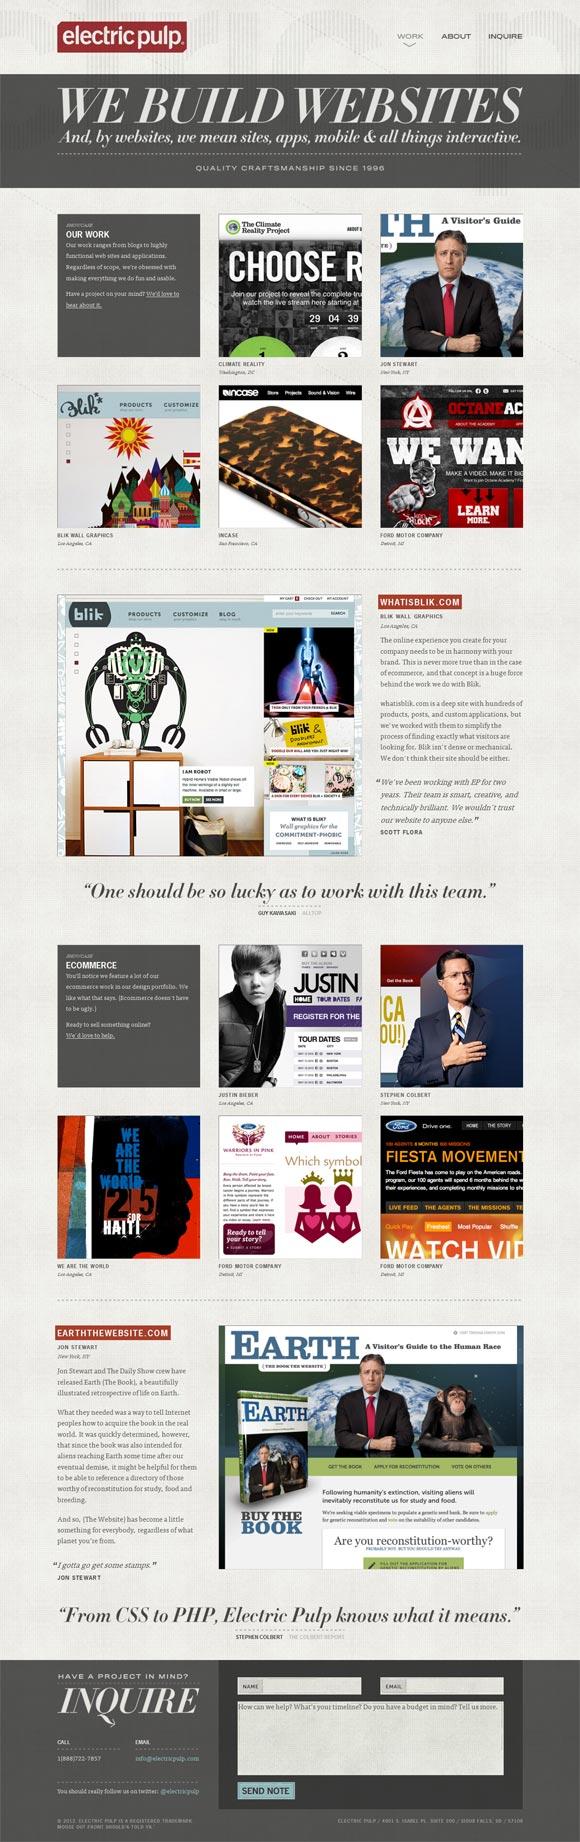 Electric Pulp | Web Design